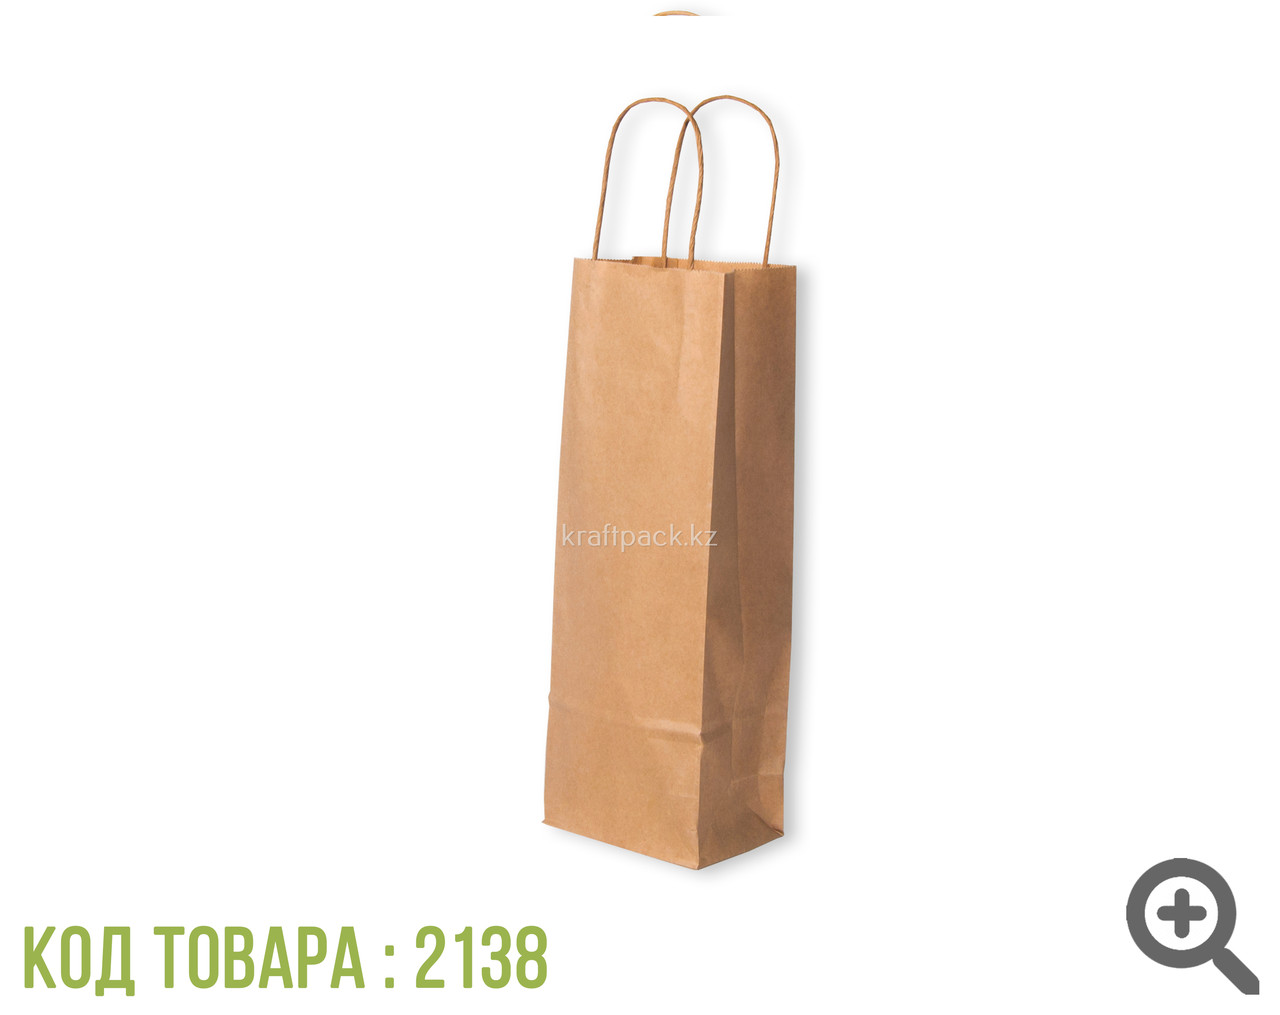 Пакет под бутылку с кручеными ручками  б/п, (крафт 70г),  120*80*330, (250 кор)